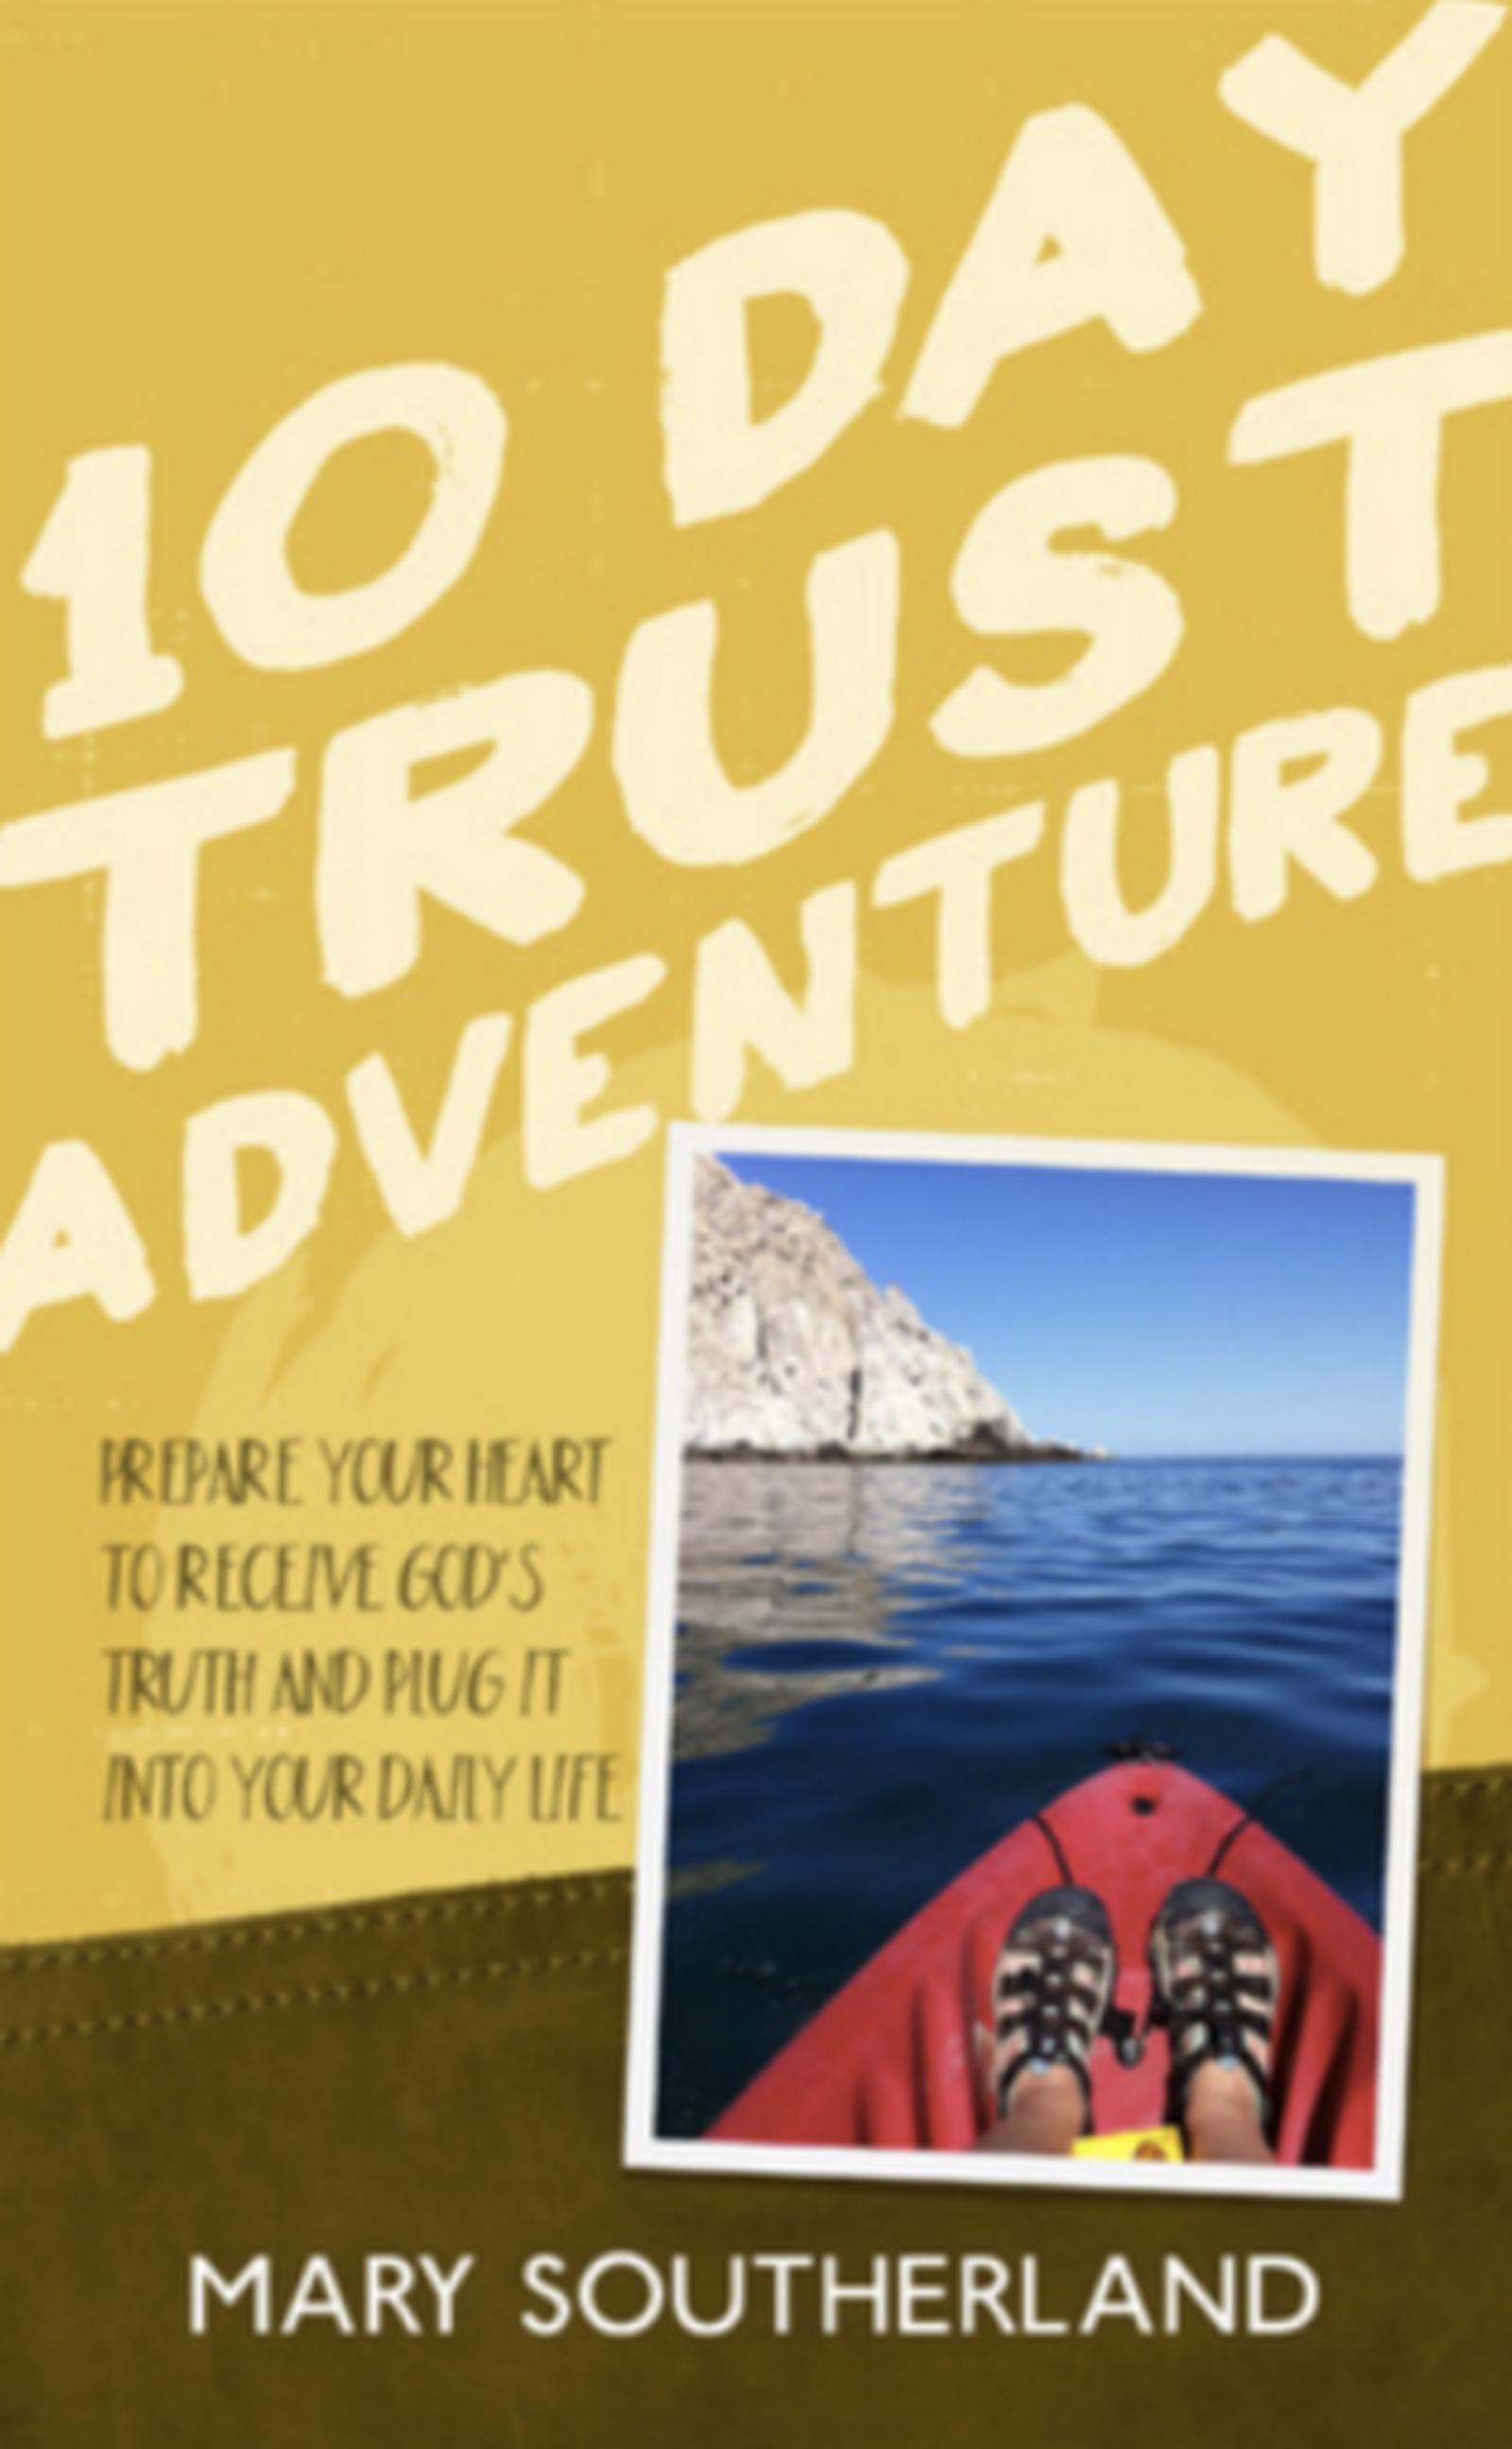 gig 10 day trust adventure girlfriends in god